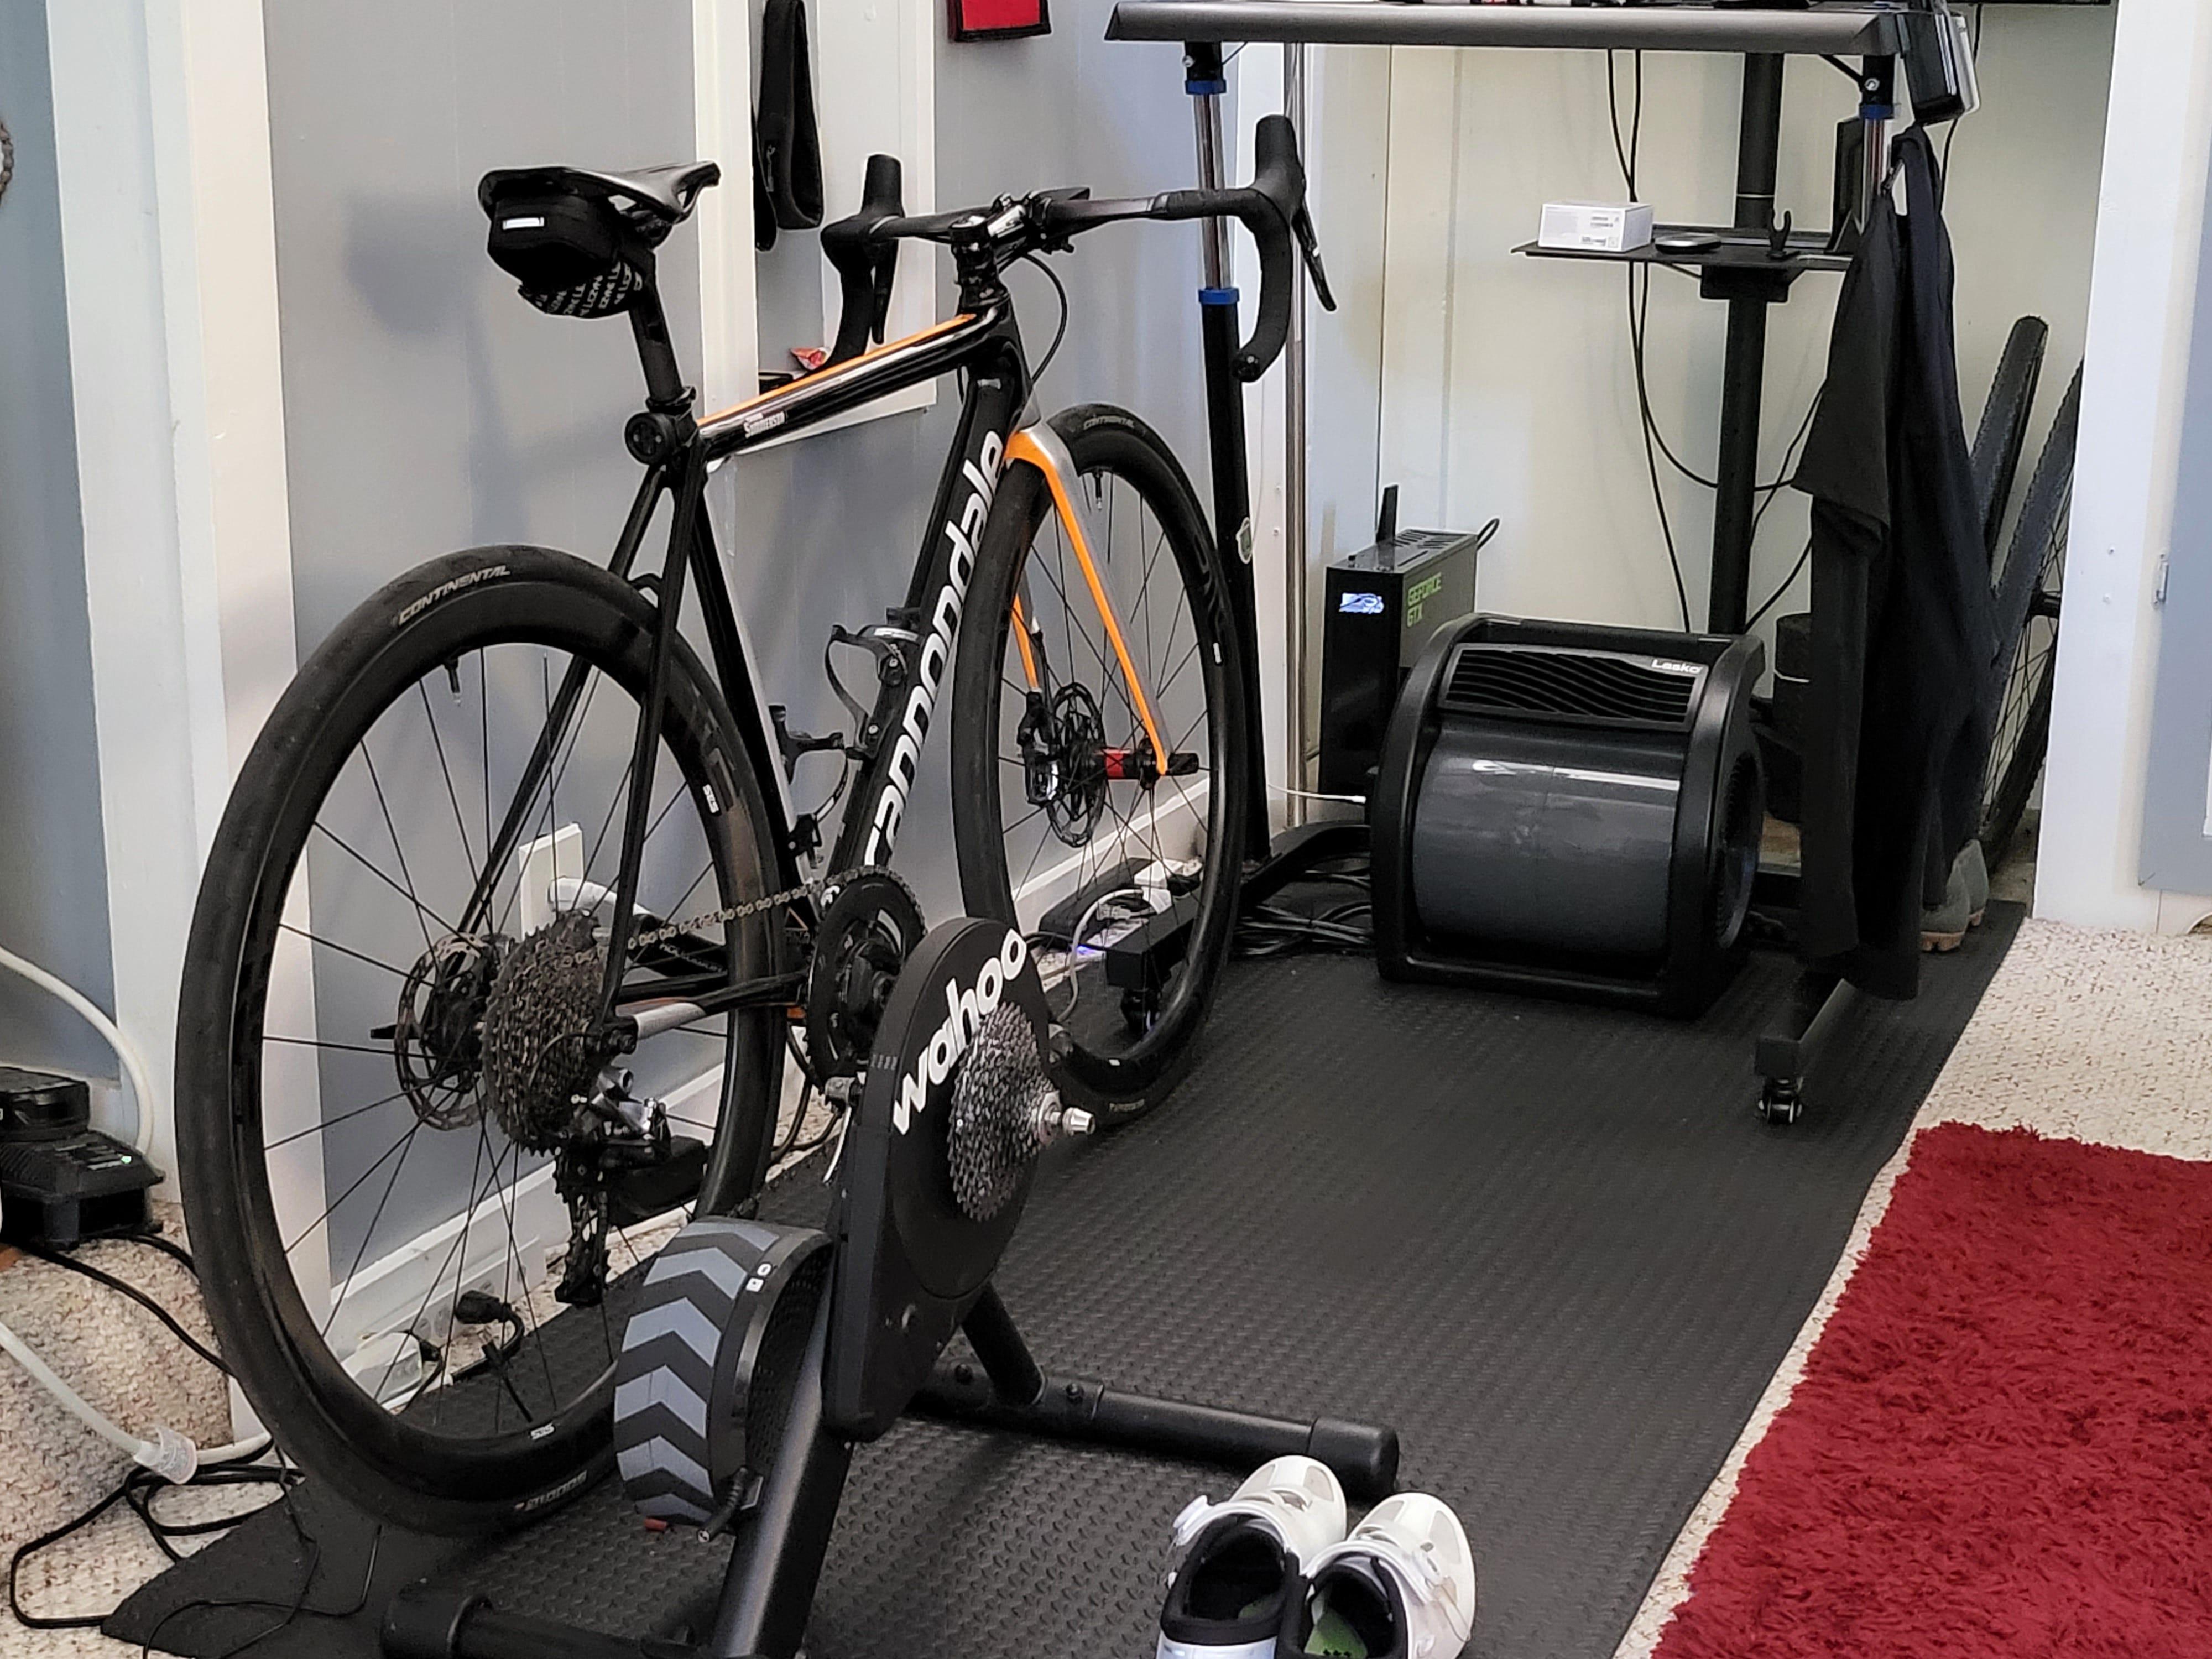 Indoor shot of a bike, trainer, shoes, etc.